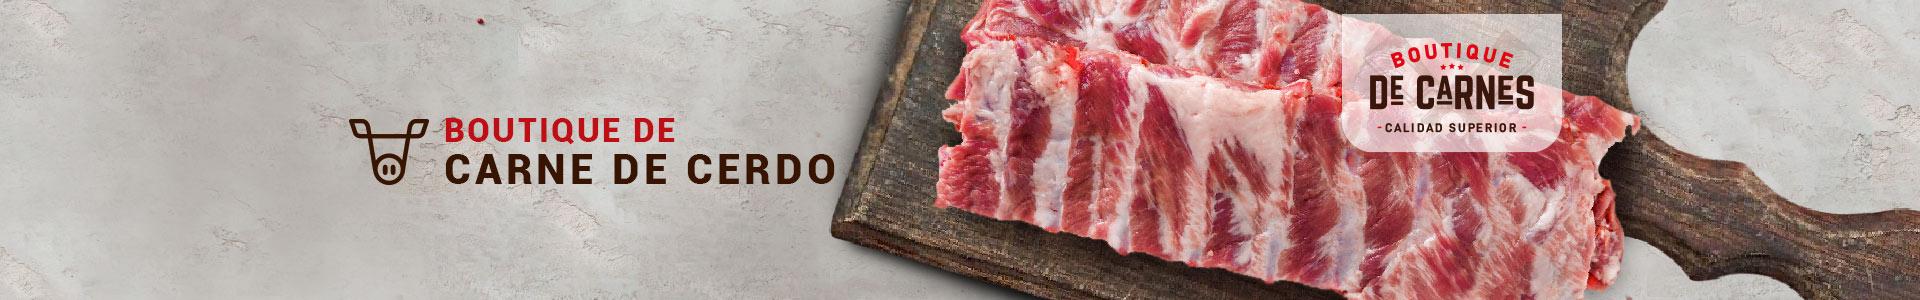 Carne de cerdo desktop